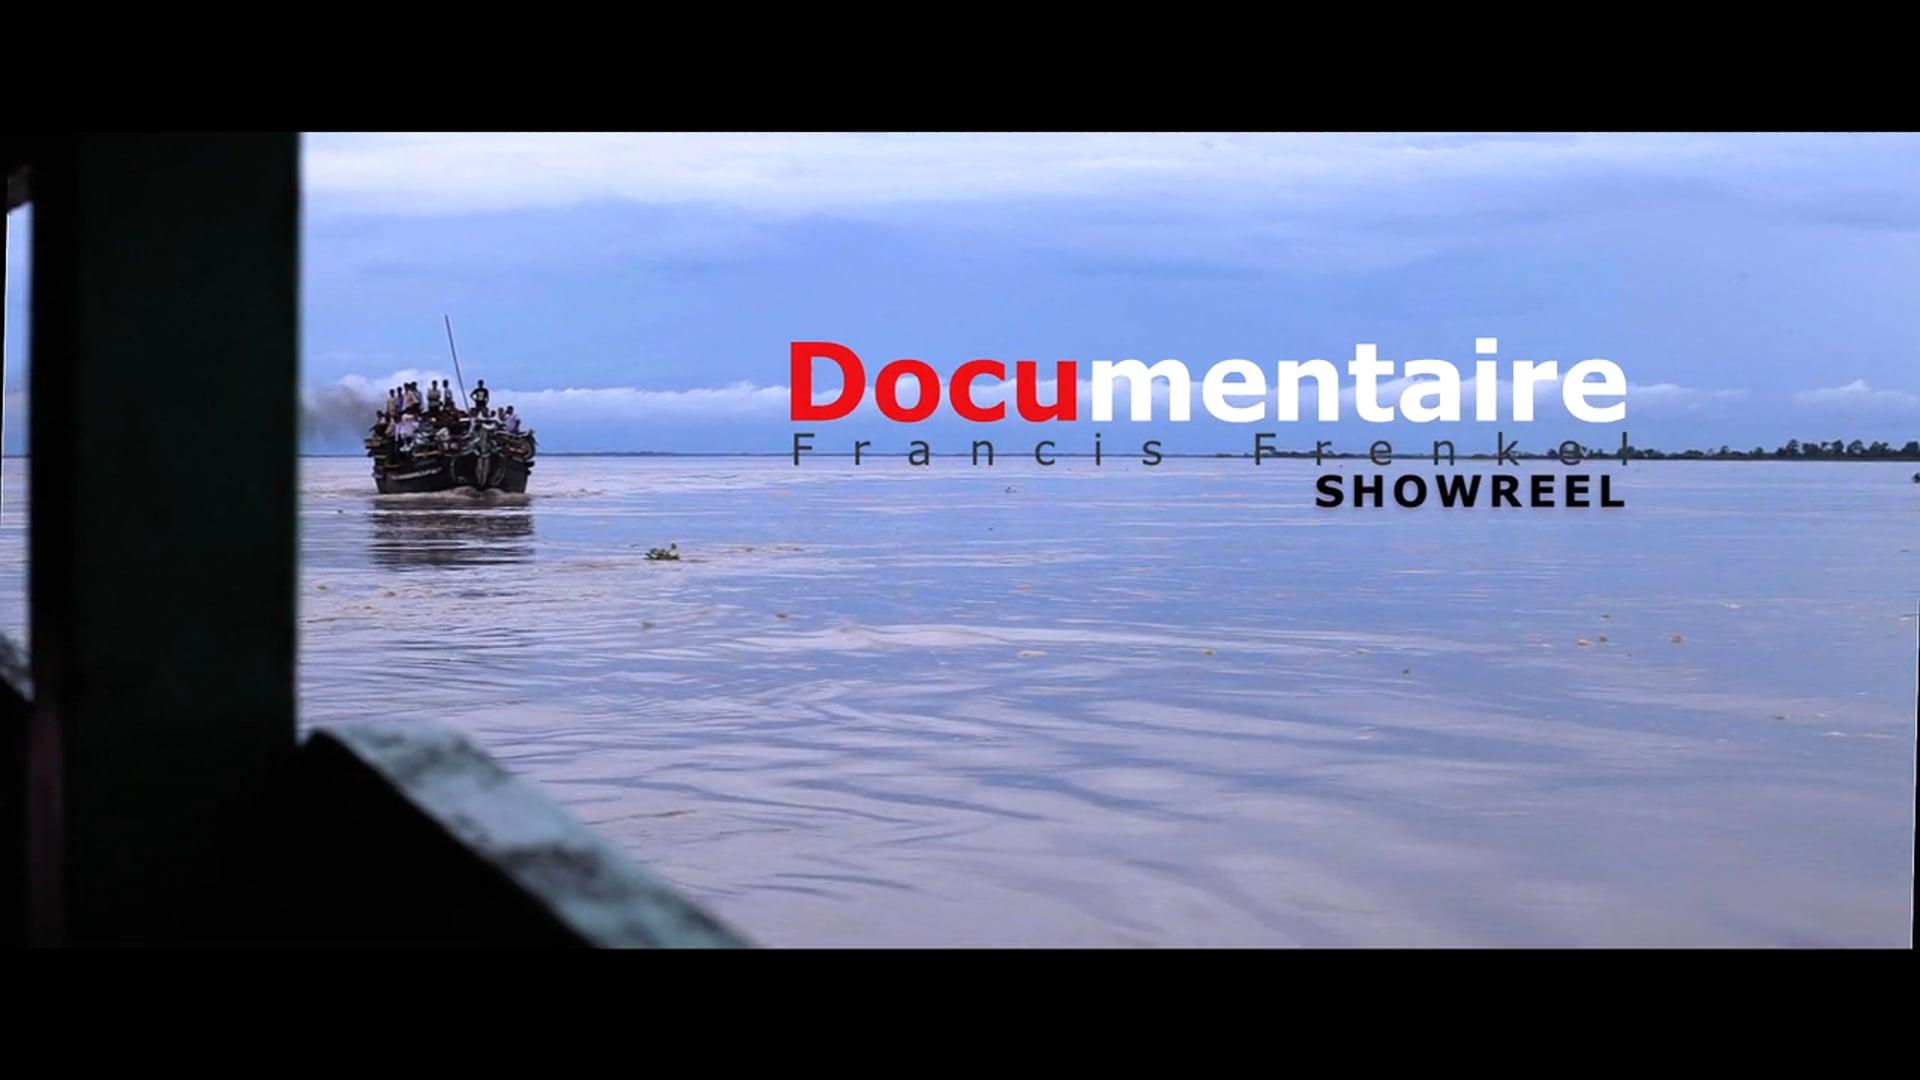 Francis Frenkel ShowReel Documentaire